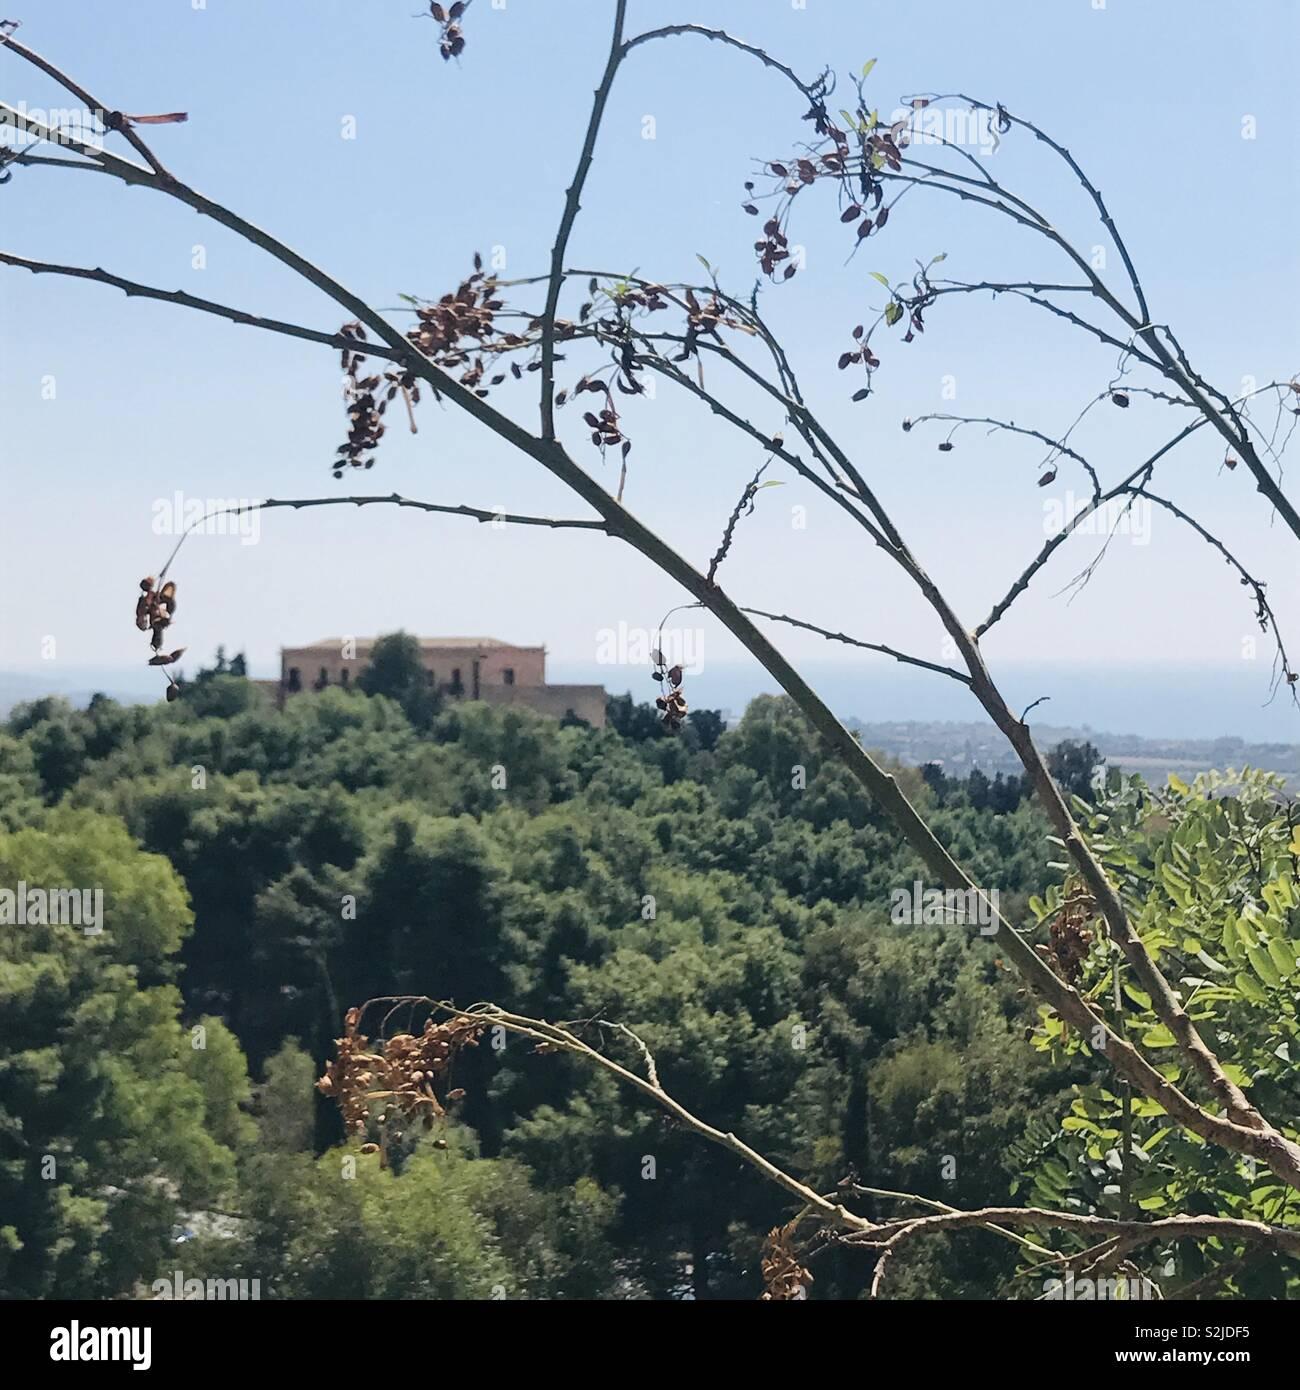 Agrigento, Sicily, 2017 - Stock Image